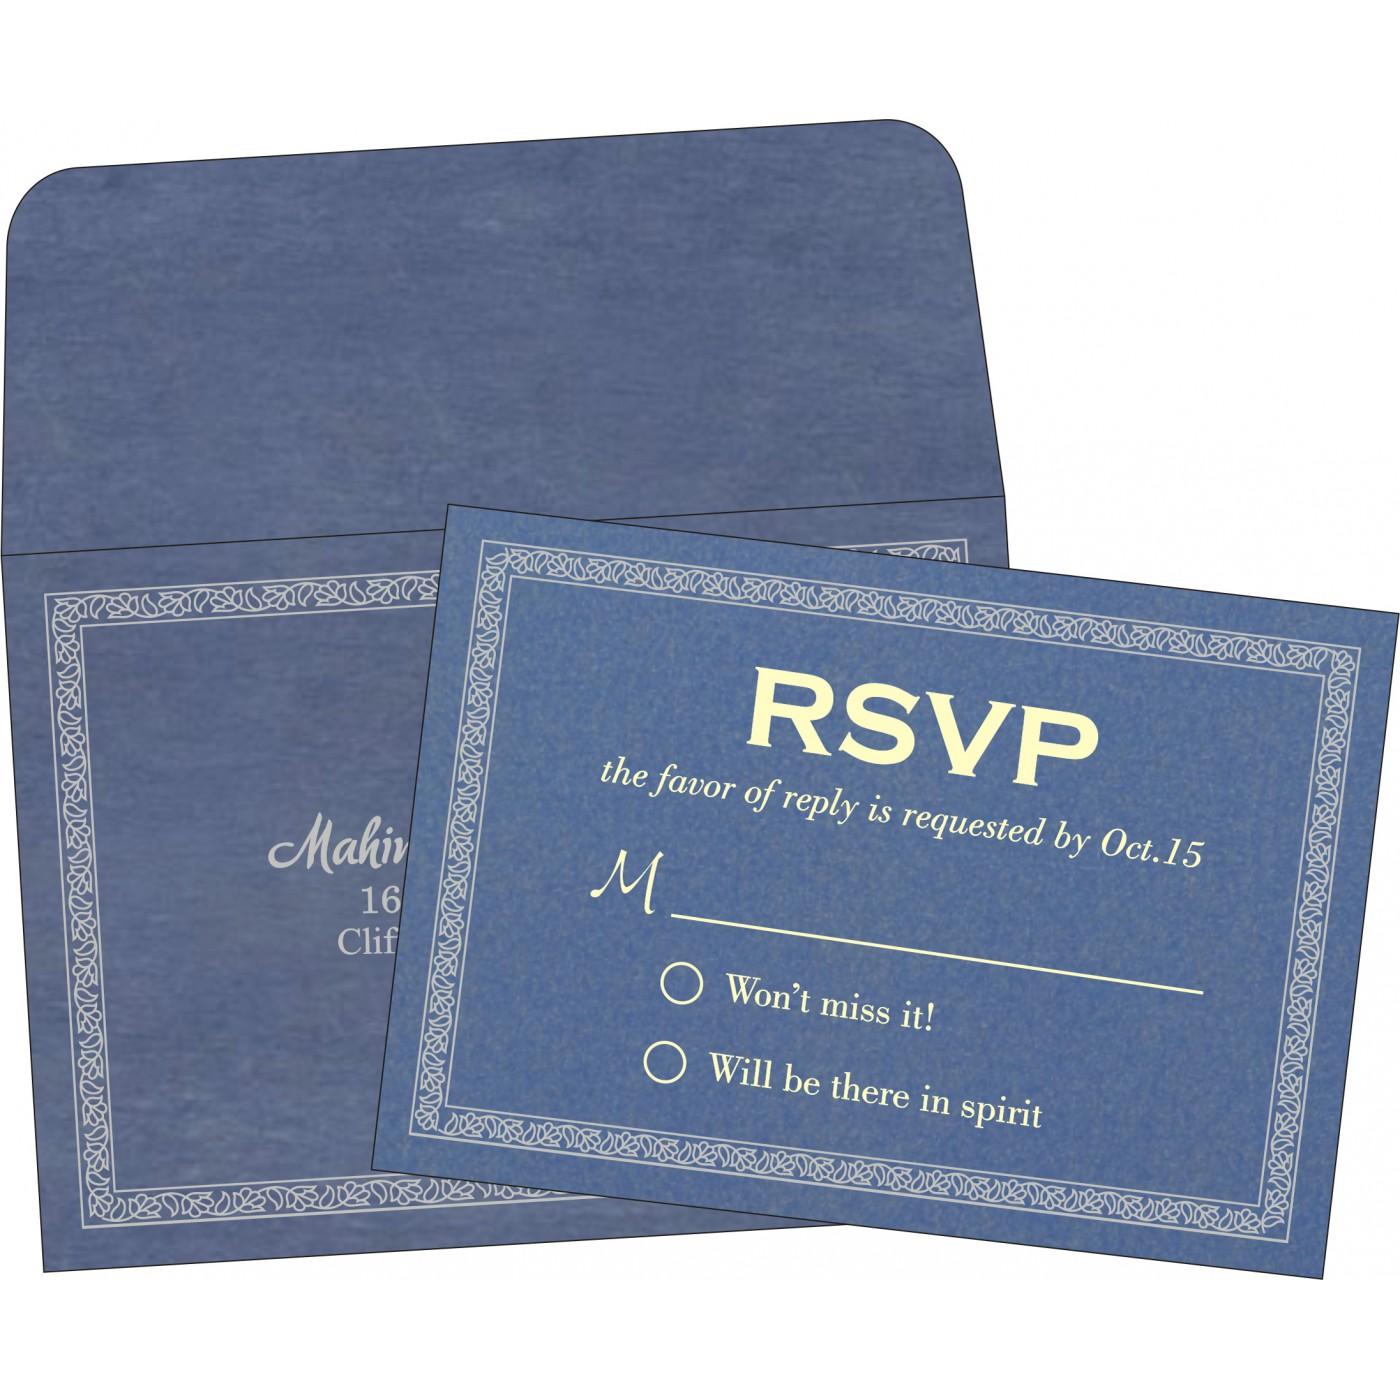 RSVP Cards - RSVP-8211P